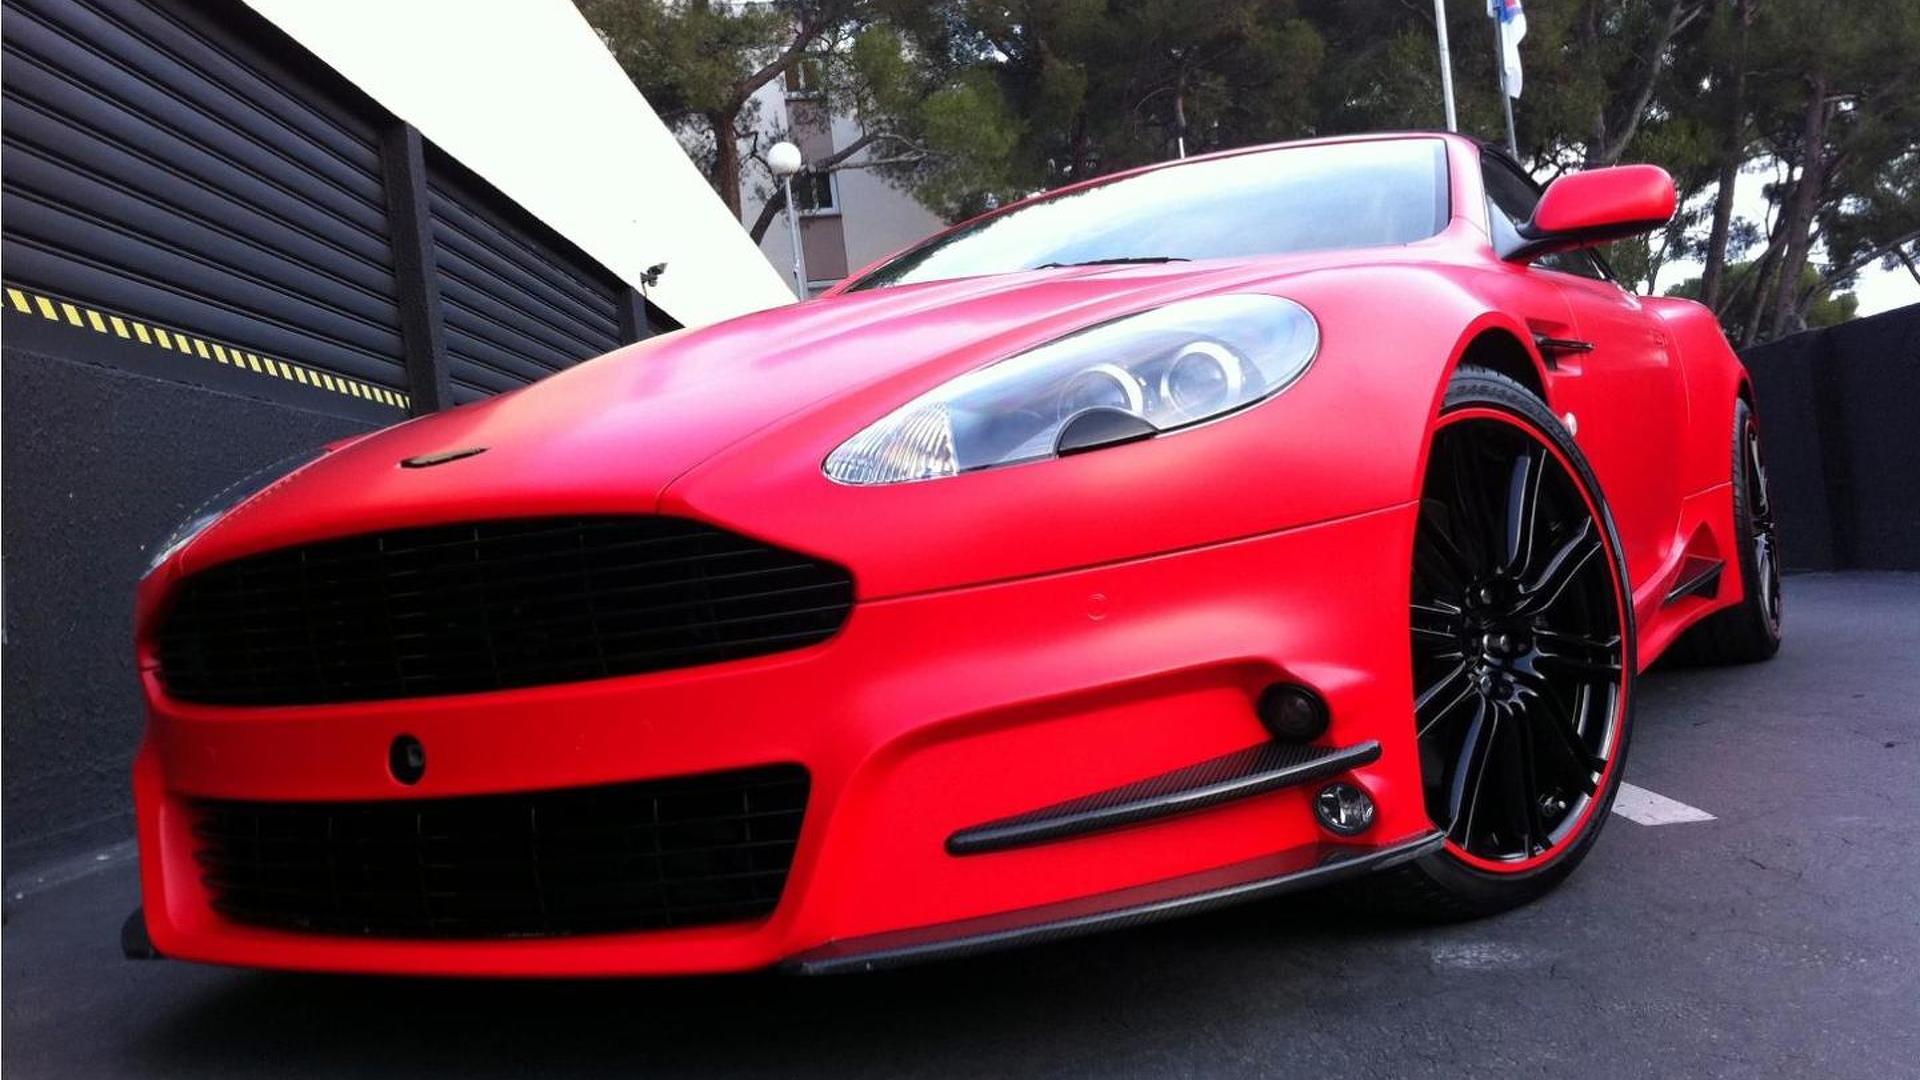 Mansory Aston Martin Dbs With Dartz Red Satin Matt Wrap 03 01 2012 1051087